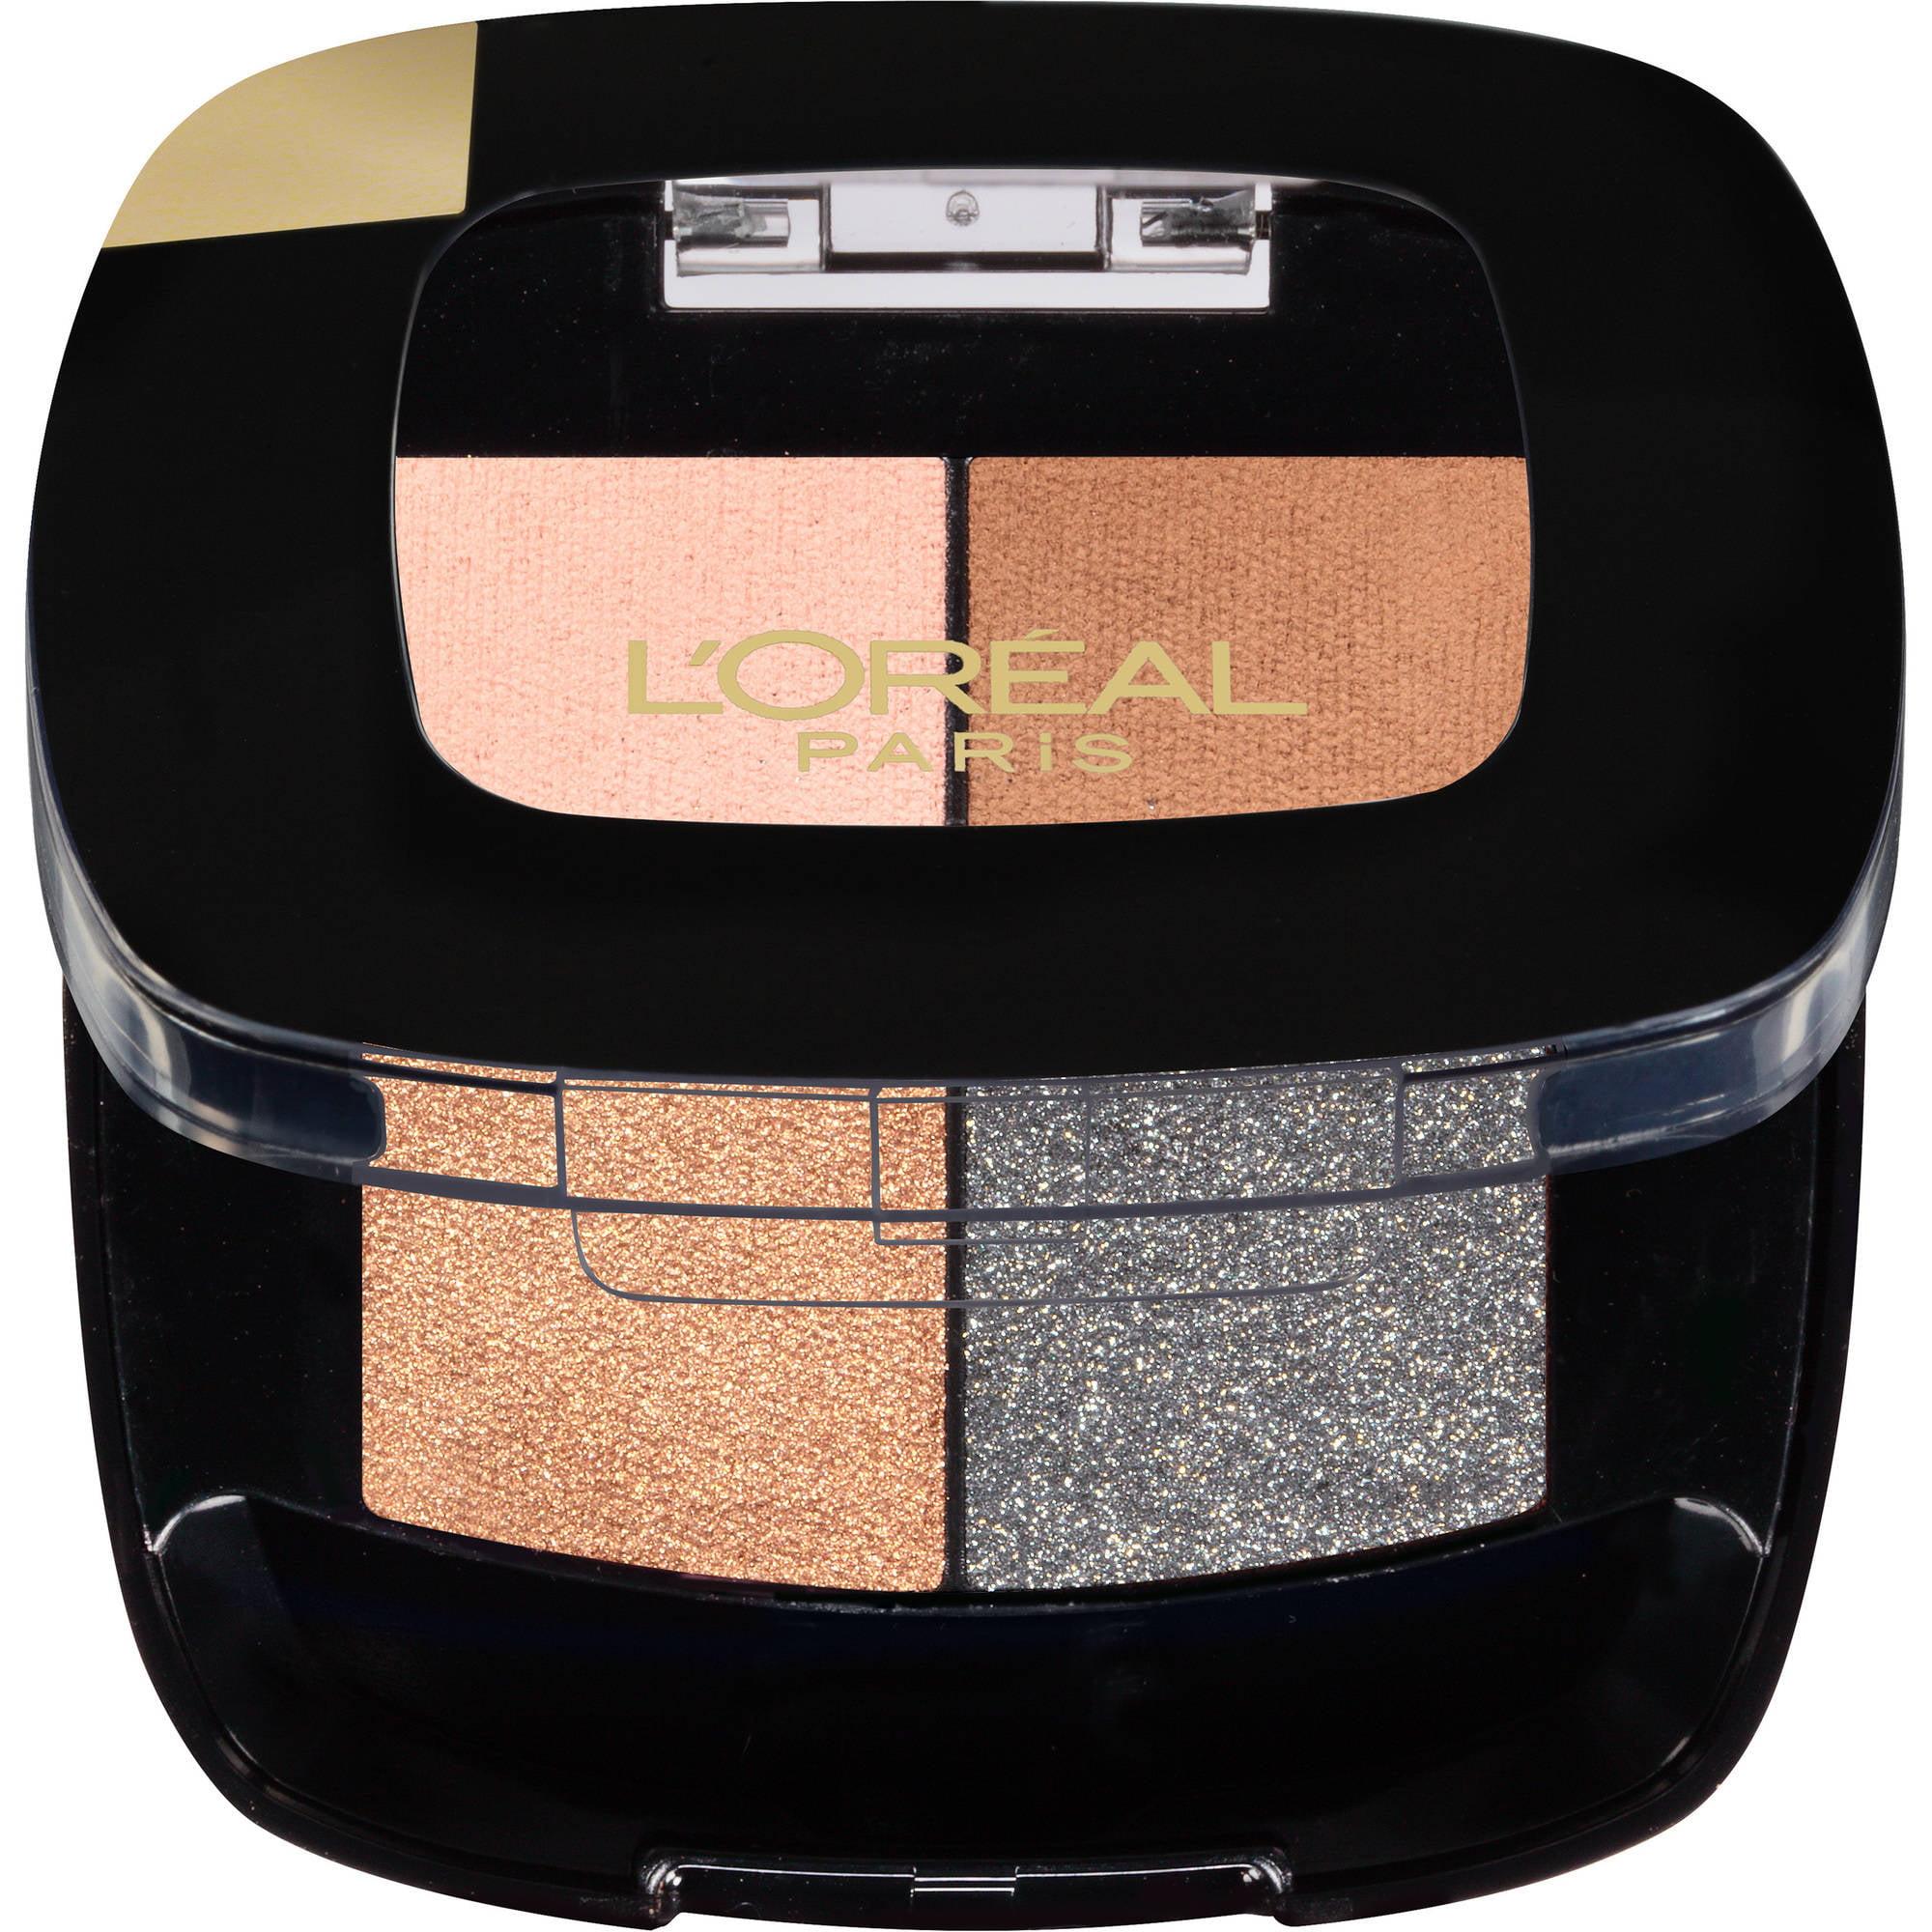 L'Oreal Paris Colour Riche Pocket Palette Eye Shadow, French Biscuit, 0.1 Oz